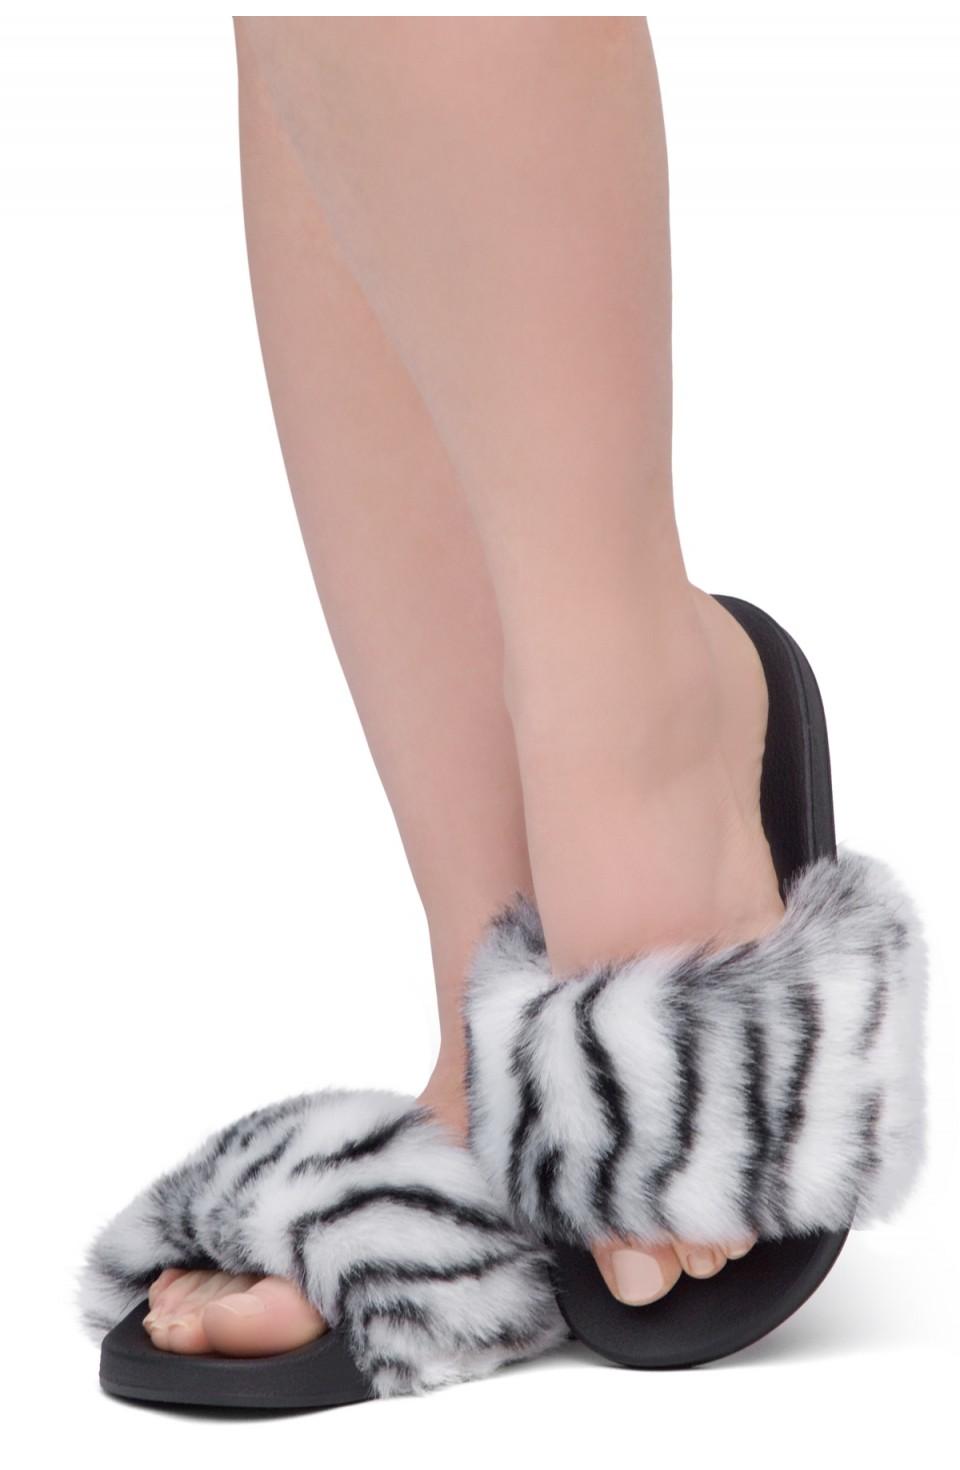 Shoe Land NIKINI Womens Fur Slides Fuzzy Slippers Fashion Fluffy Comfort Flat Sandals(2020 Zebra/Black)